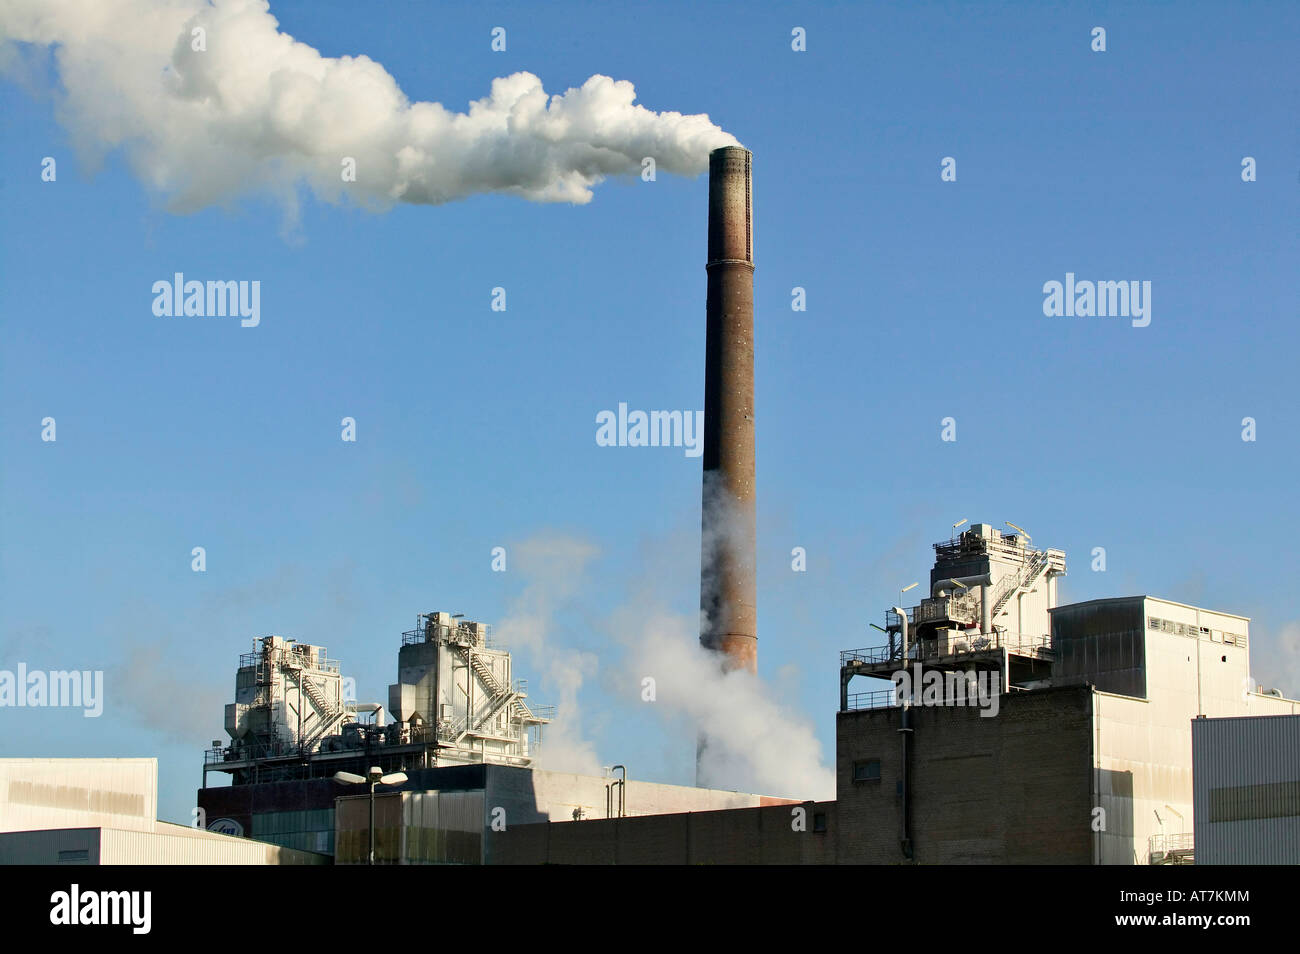 chemical industry plant Bayer Uerdingen Germany - Stock Image